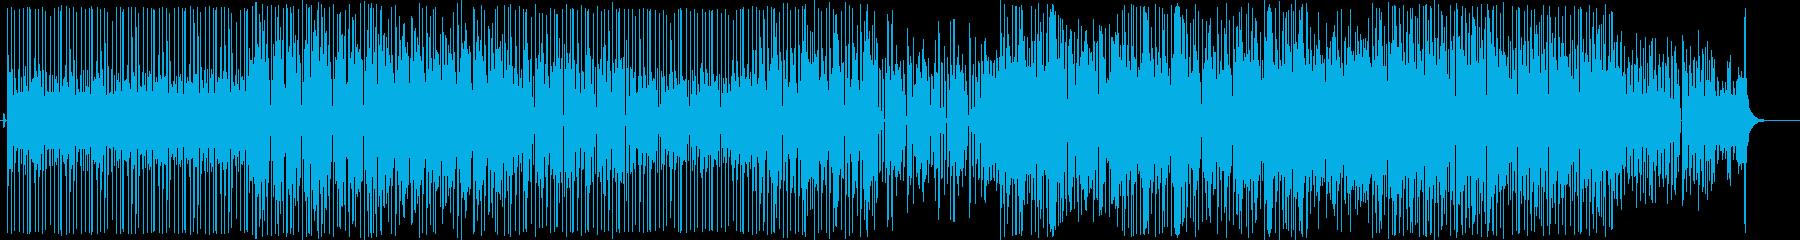 8bitカワイイ ダンスビートの再生済みの波形